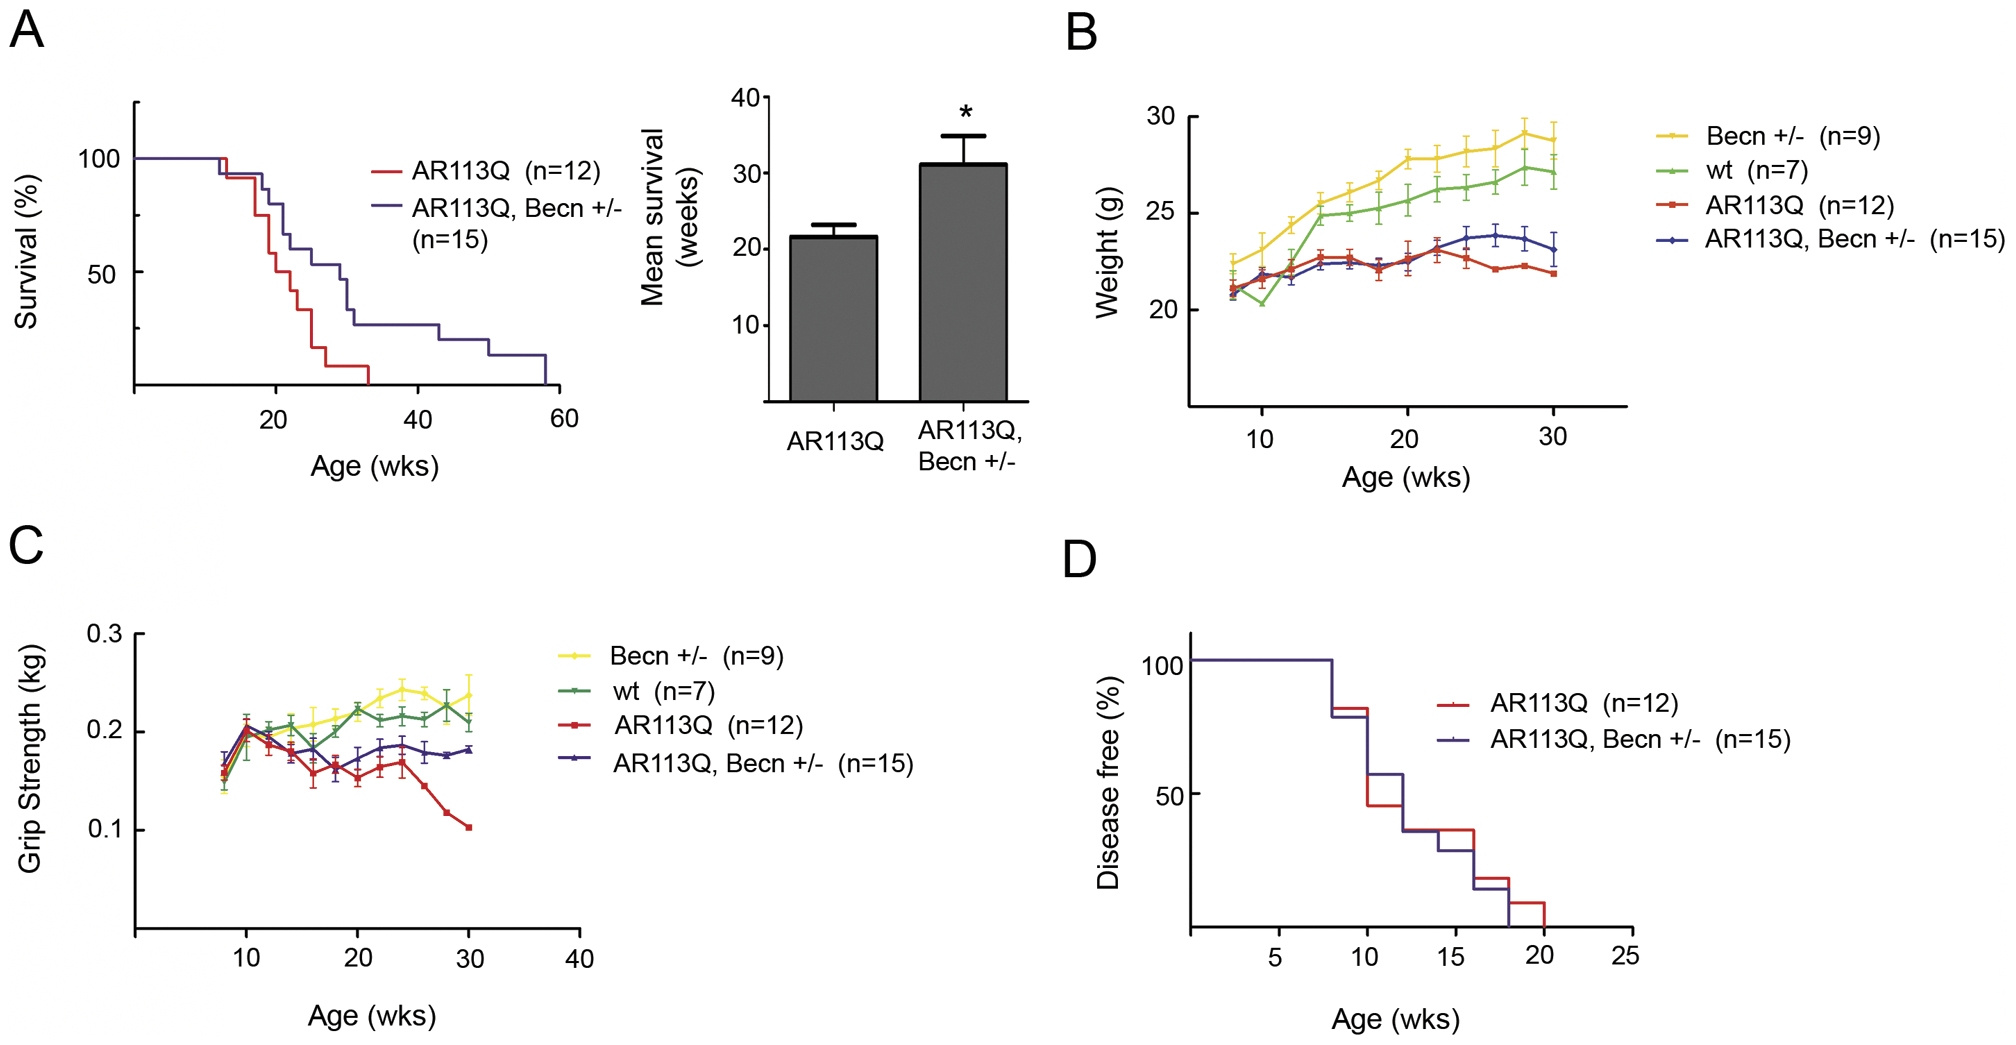 Beclin-1 haploinsufficiency extends lifespan in AR113Q males.